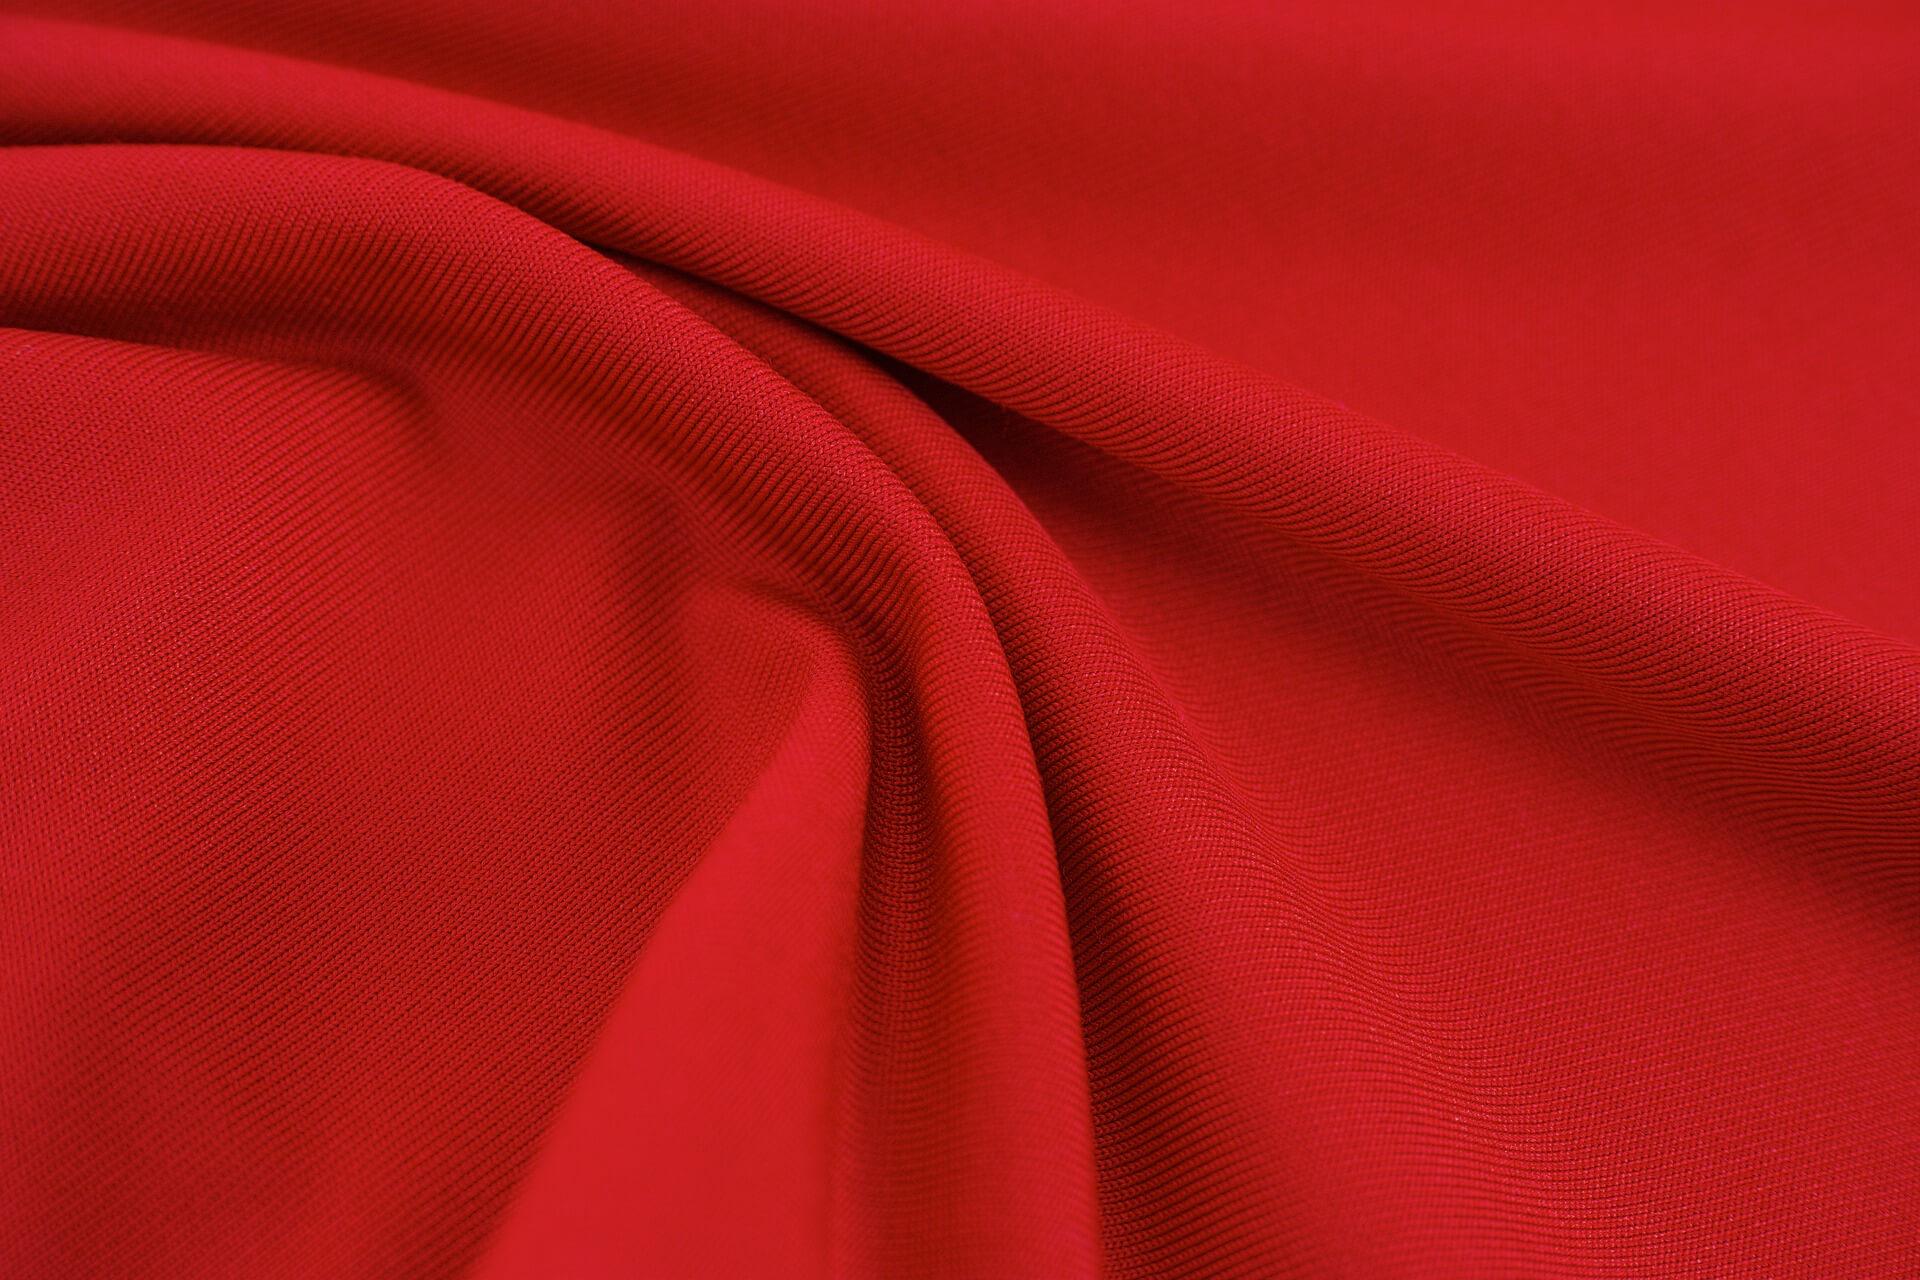 clothing-fabrics-blends-canvas-etc